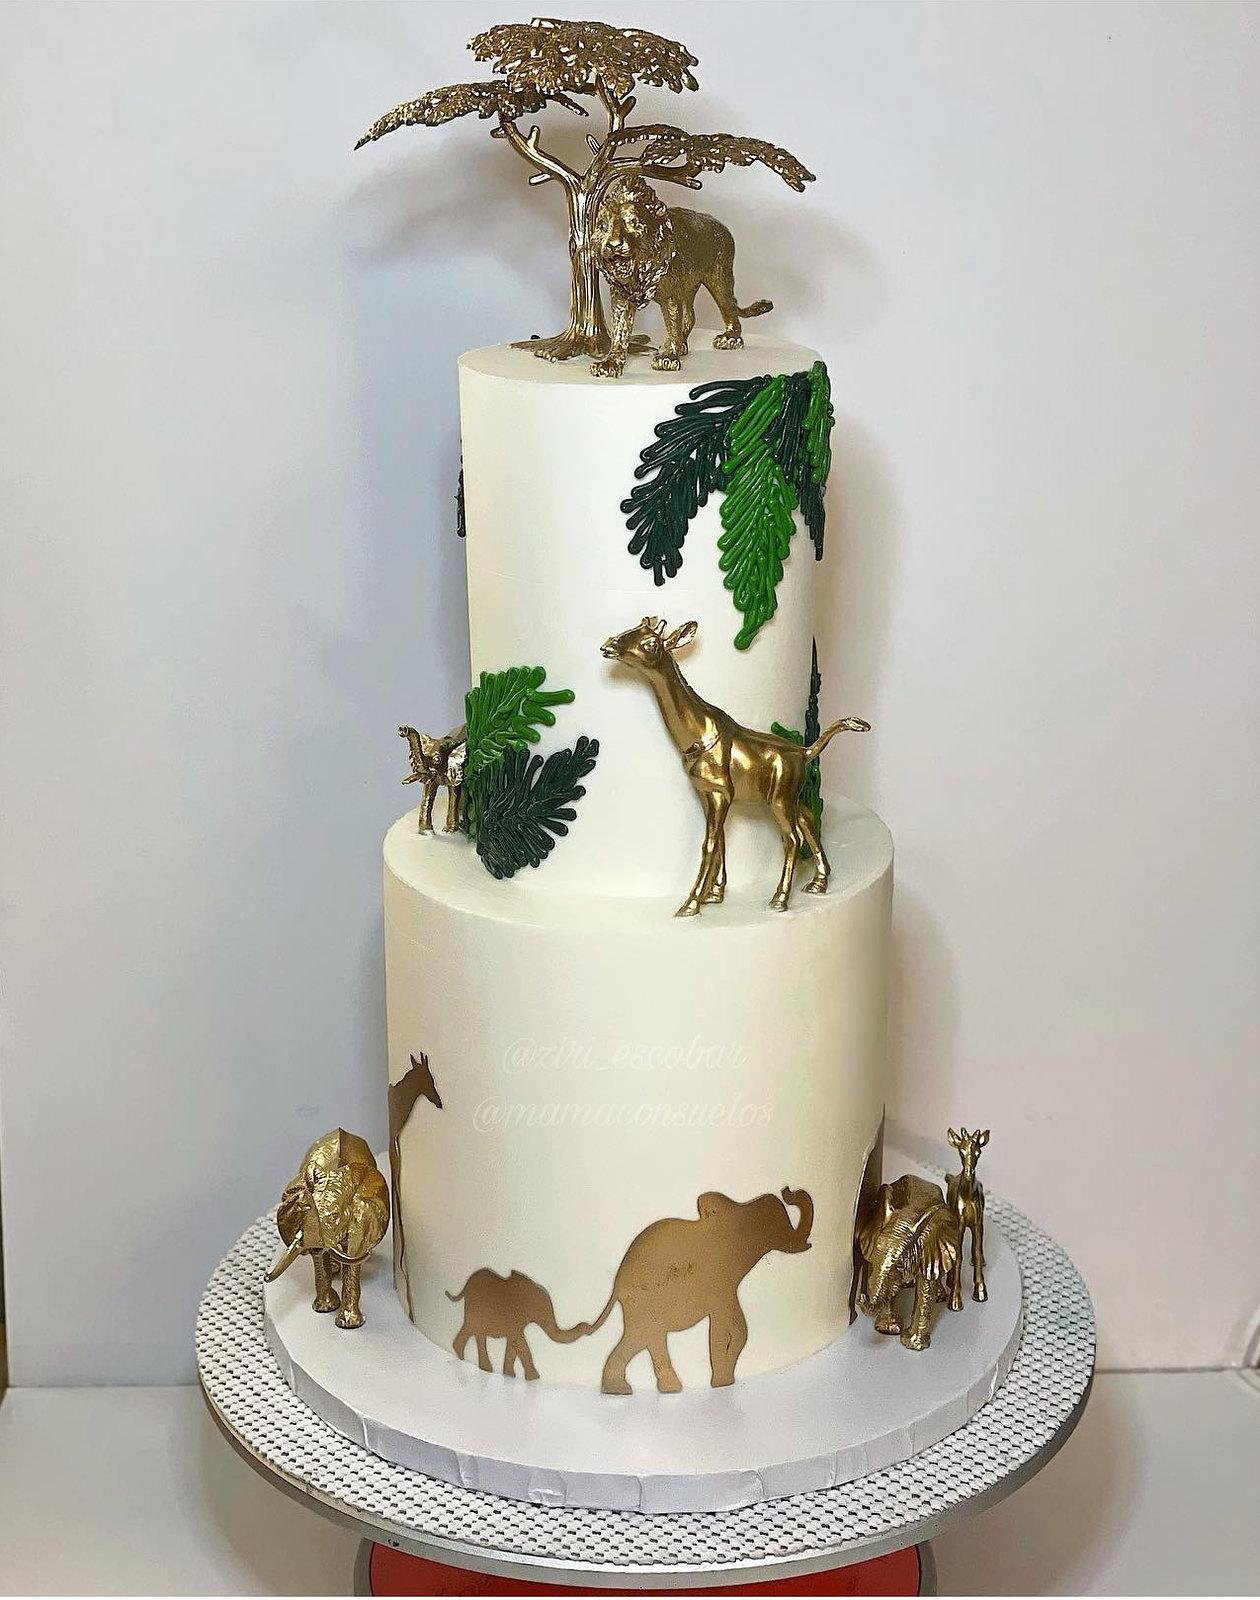 Cake by Mamá Consuelo's Bakery